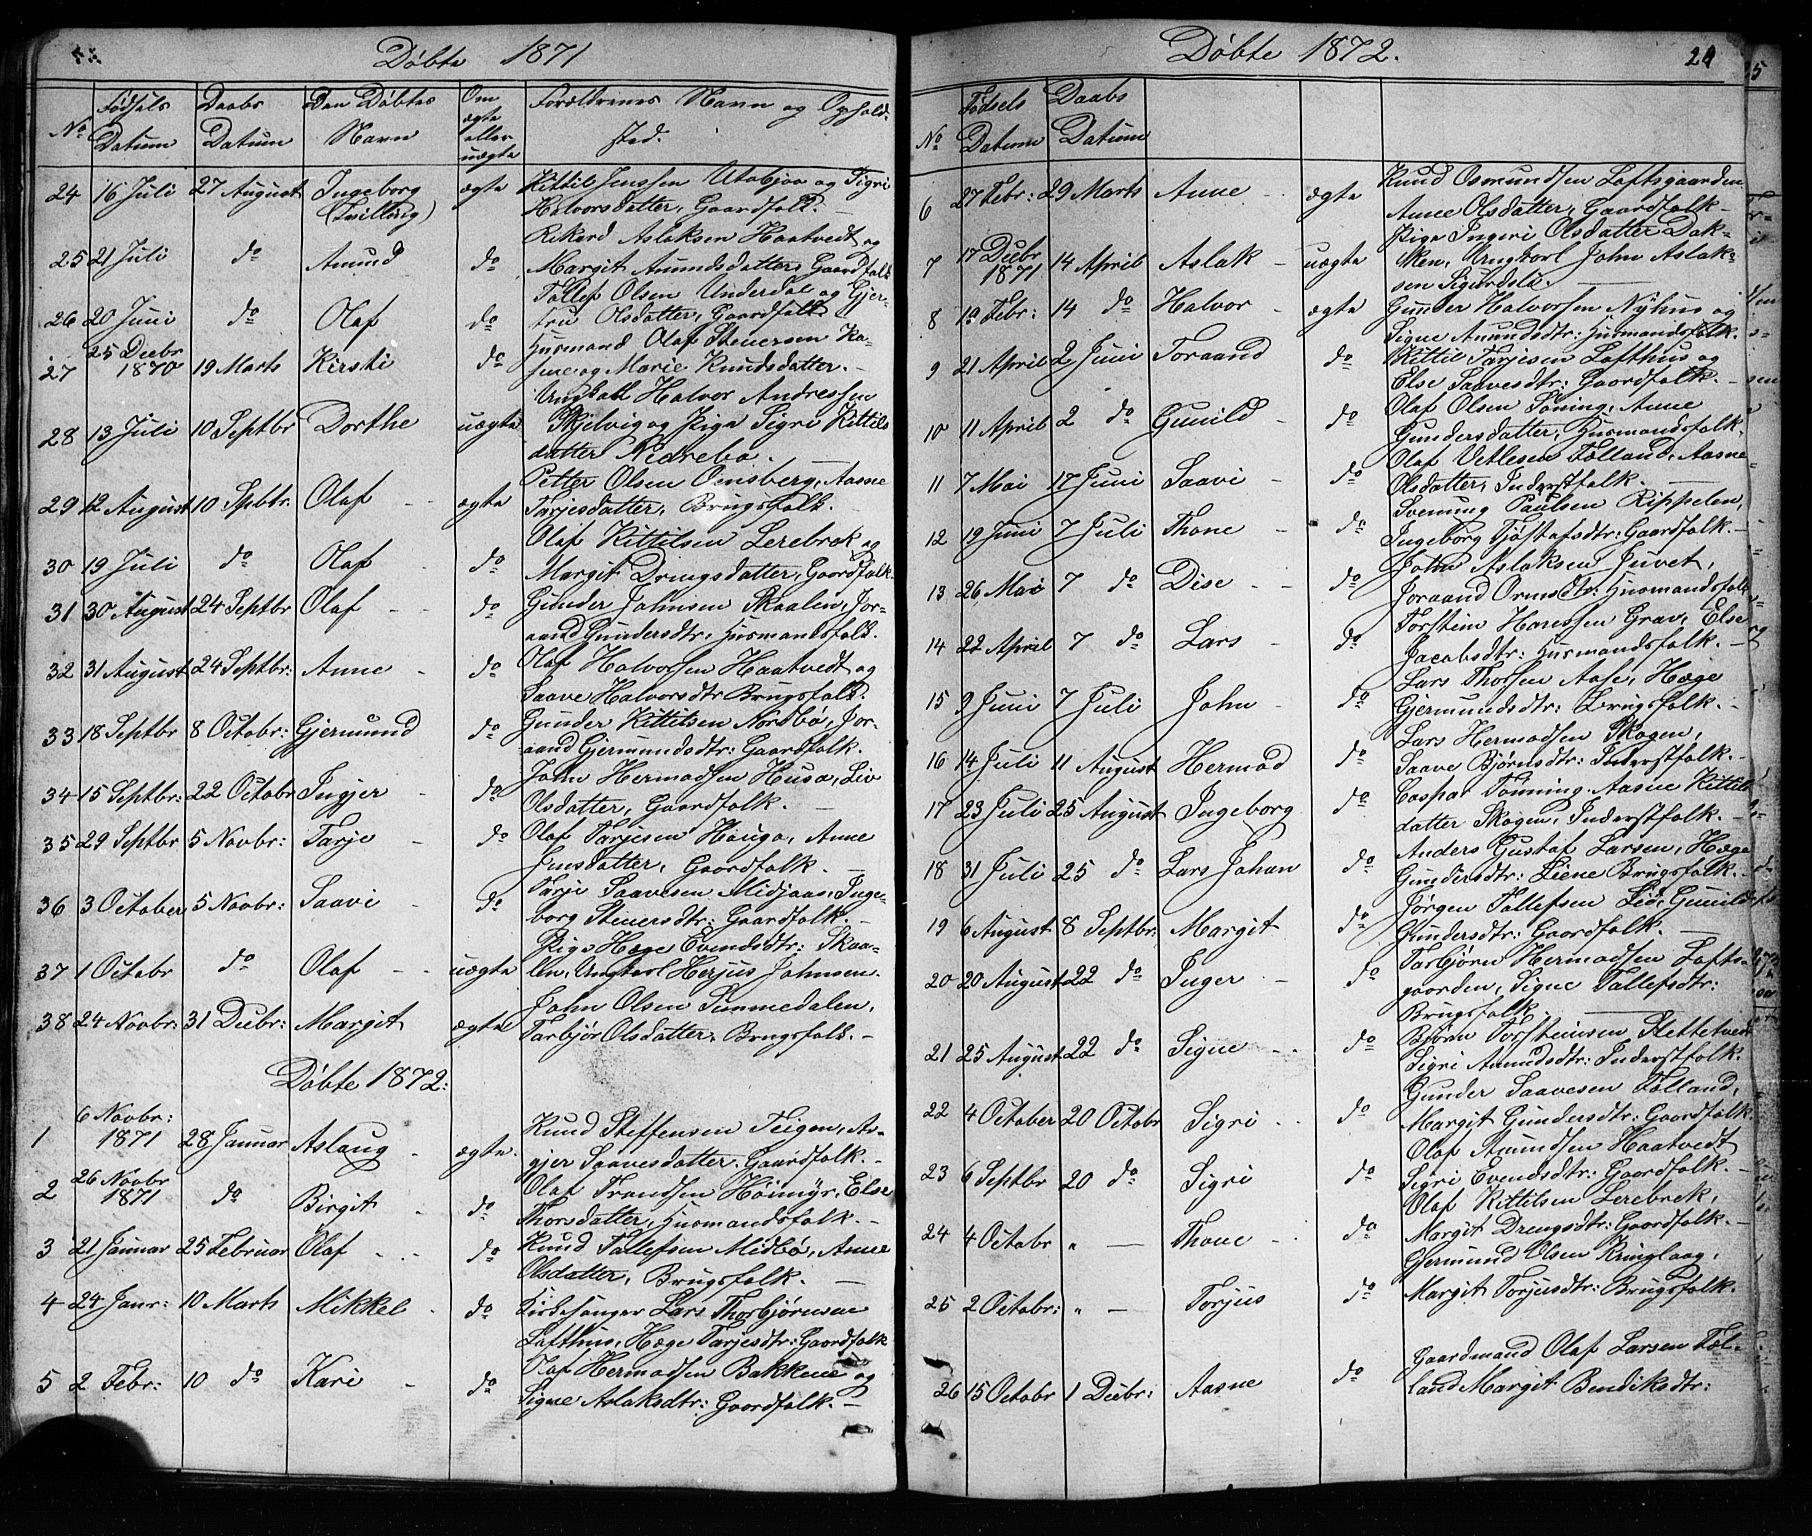 SAKO, Mo kirkebøker, G/Ga/L0001: Klokkerbok nr. I 1, 1851-1891, s. 24